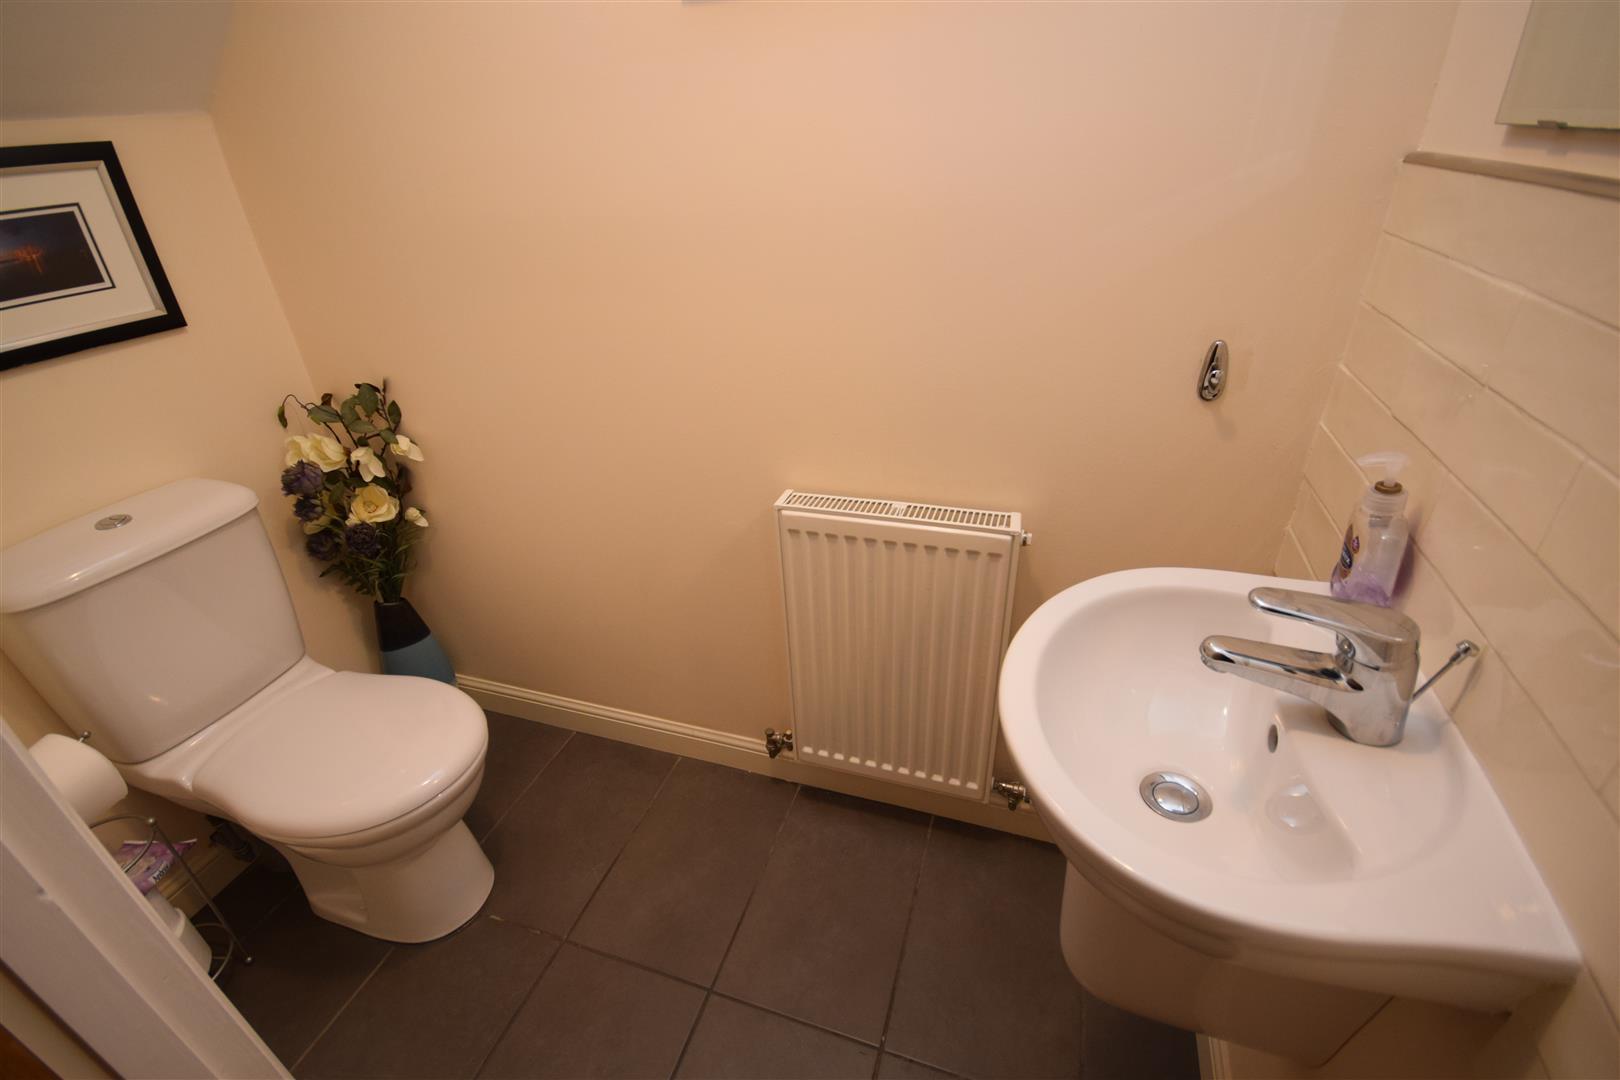 4, Bertram Dickson Place, Errol, Errol, Perthshire, PH2 7UY, UK